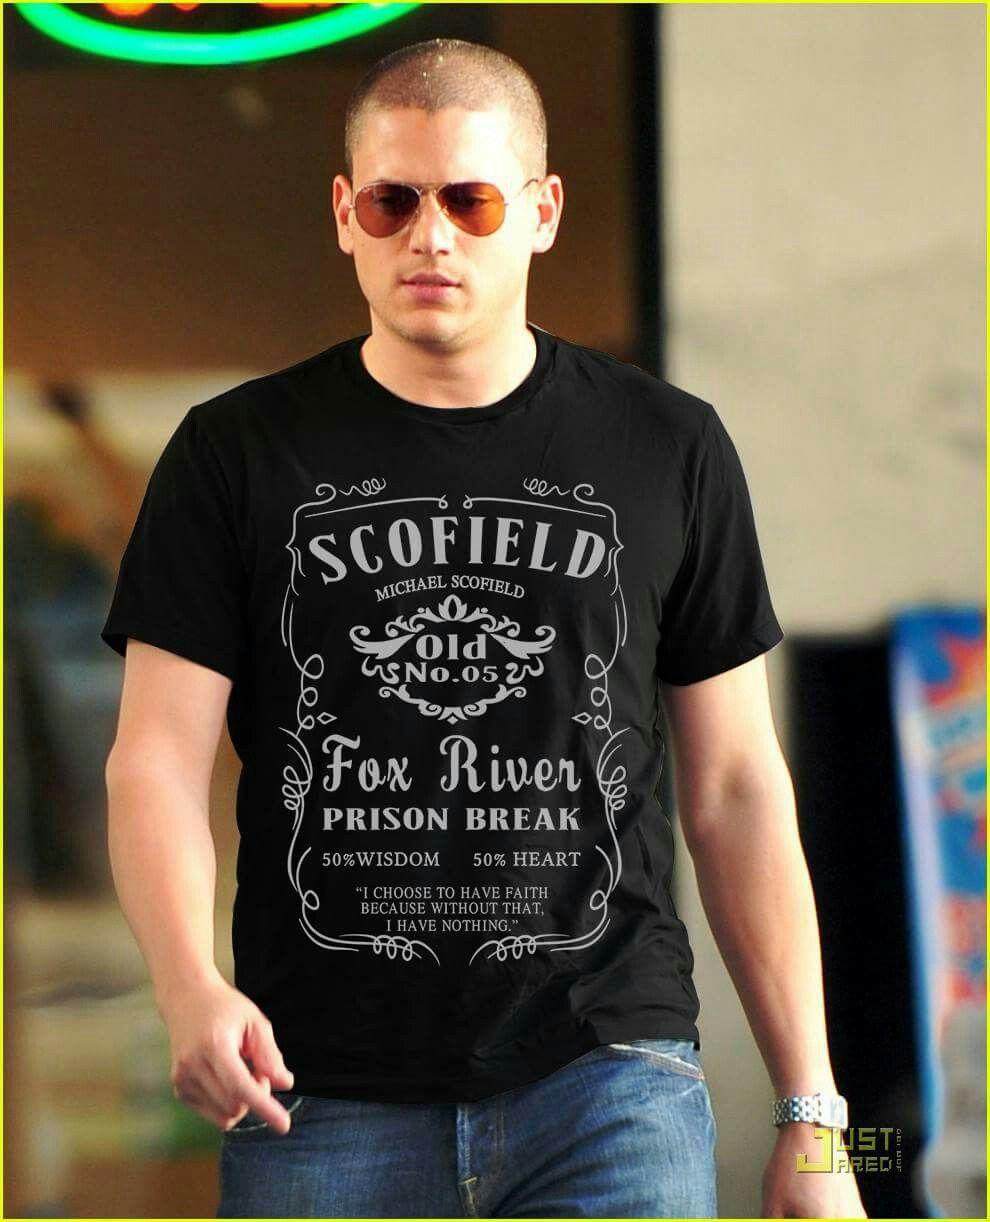 Black t shirt michaels - Wentworth Miller Wearning A Michael Scofield Shirt I Need That Shirt